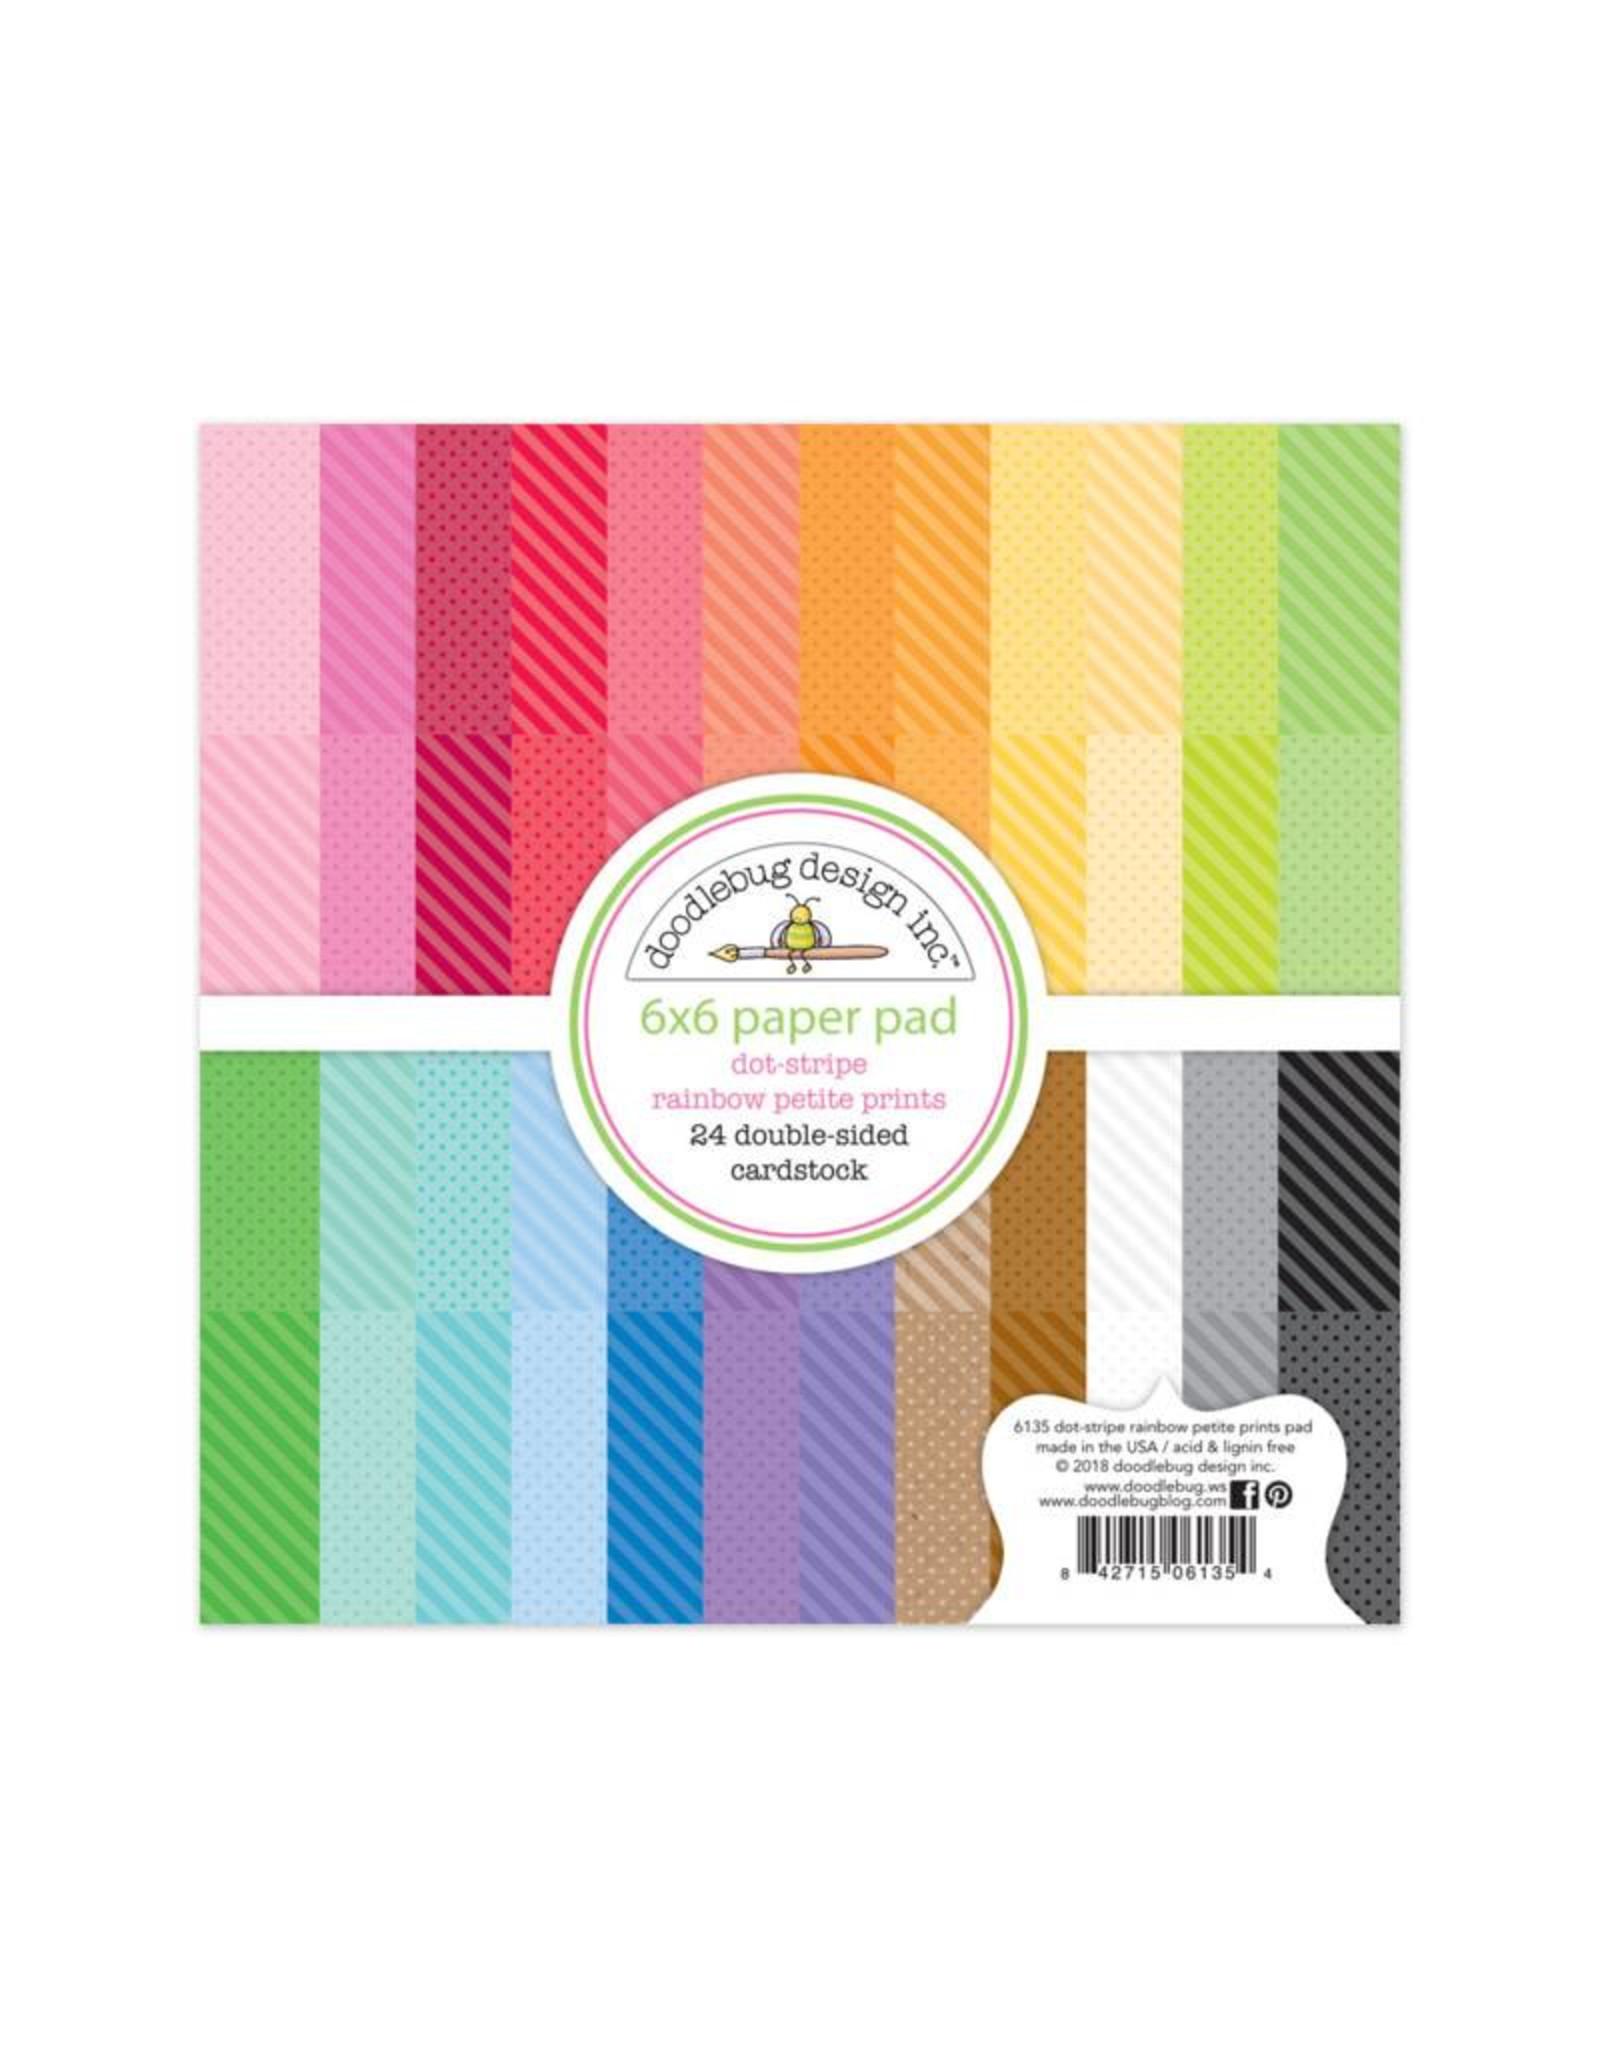 Doodlebug Doodlebug Dot-Stripe Rainbow Petite Prints 6x6 Paper Pad